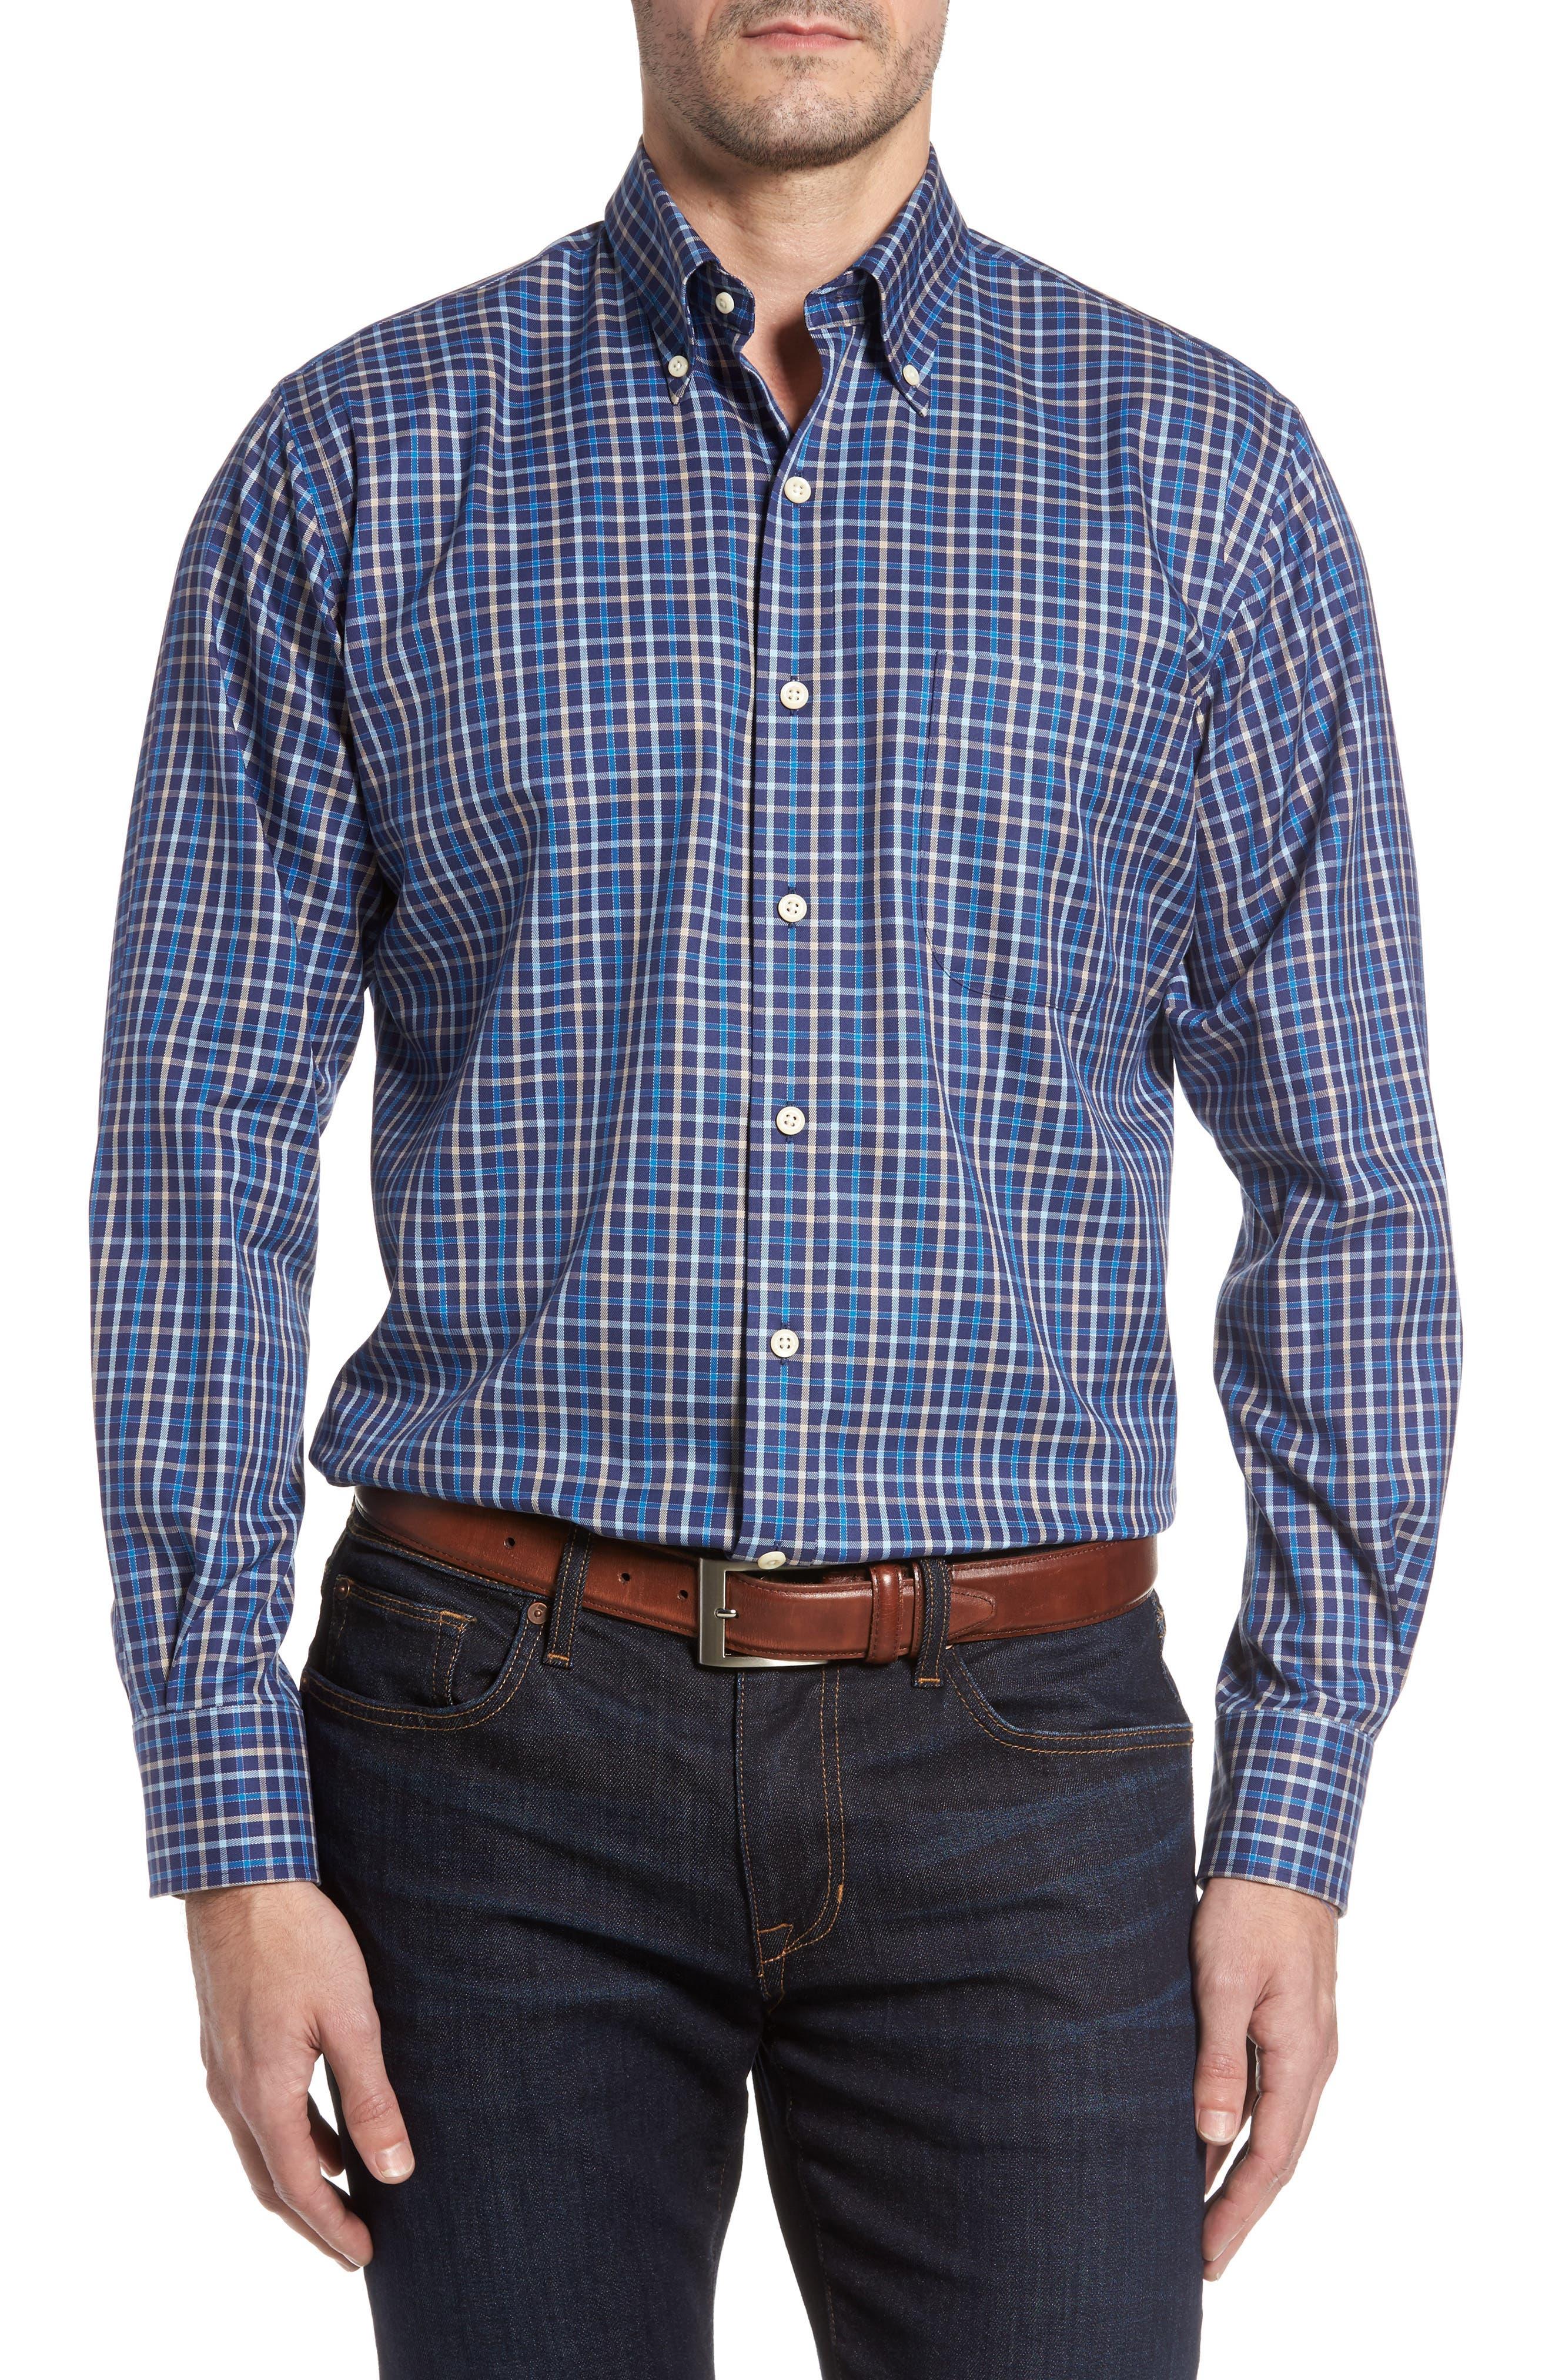 Alternate Image 1 Selected - Peter Millar Nanoluxe Pinwheel Regular Fit Check Sport Shirt